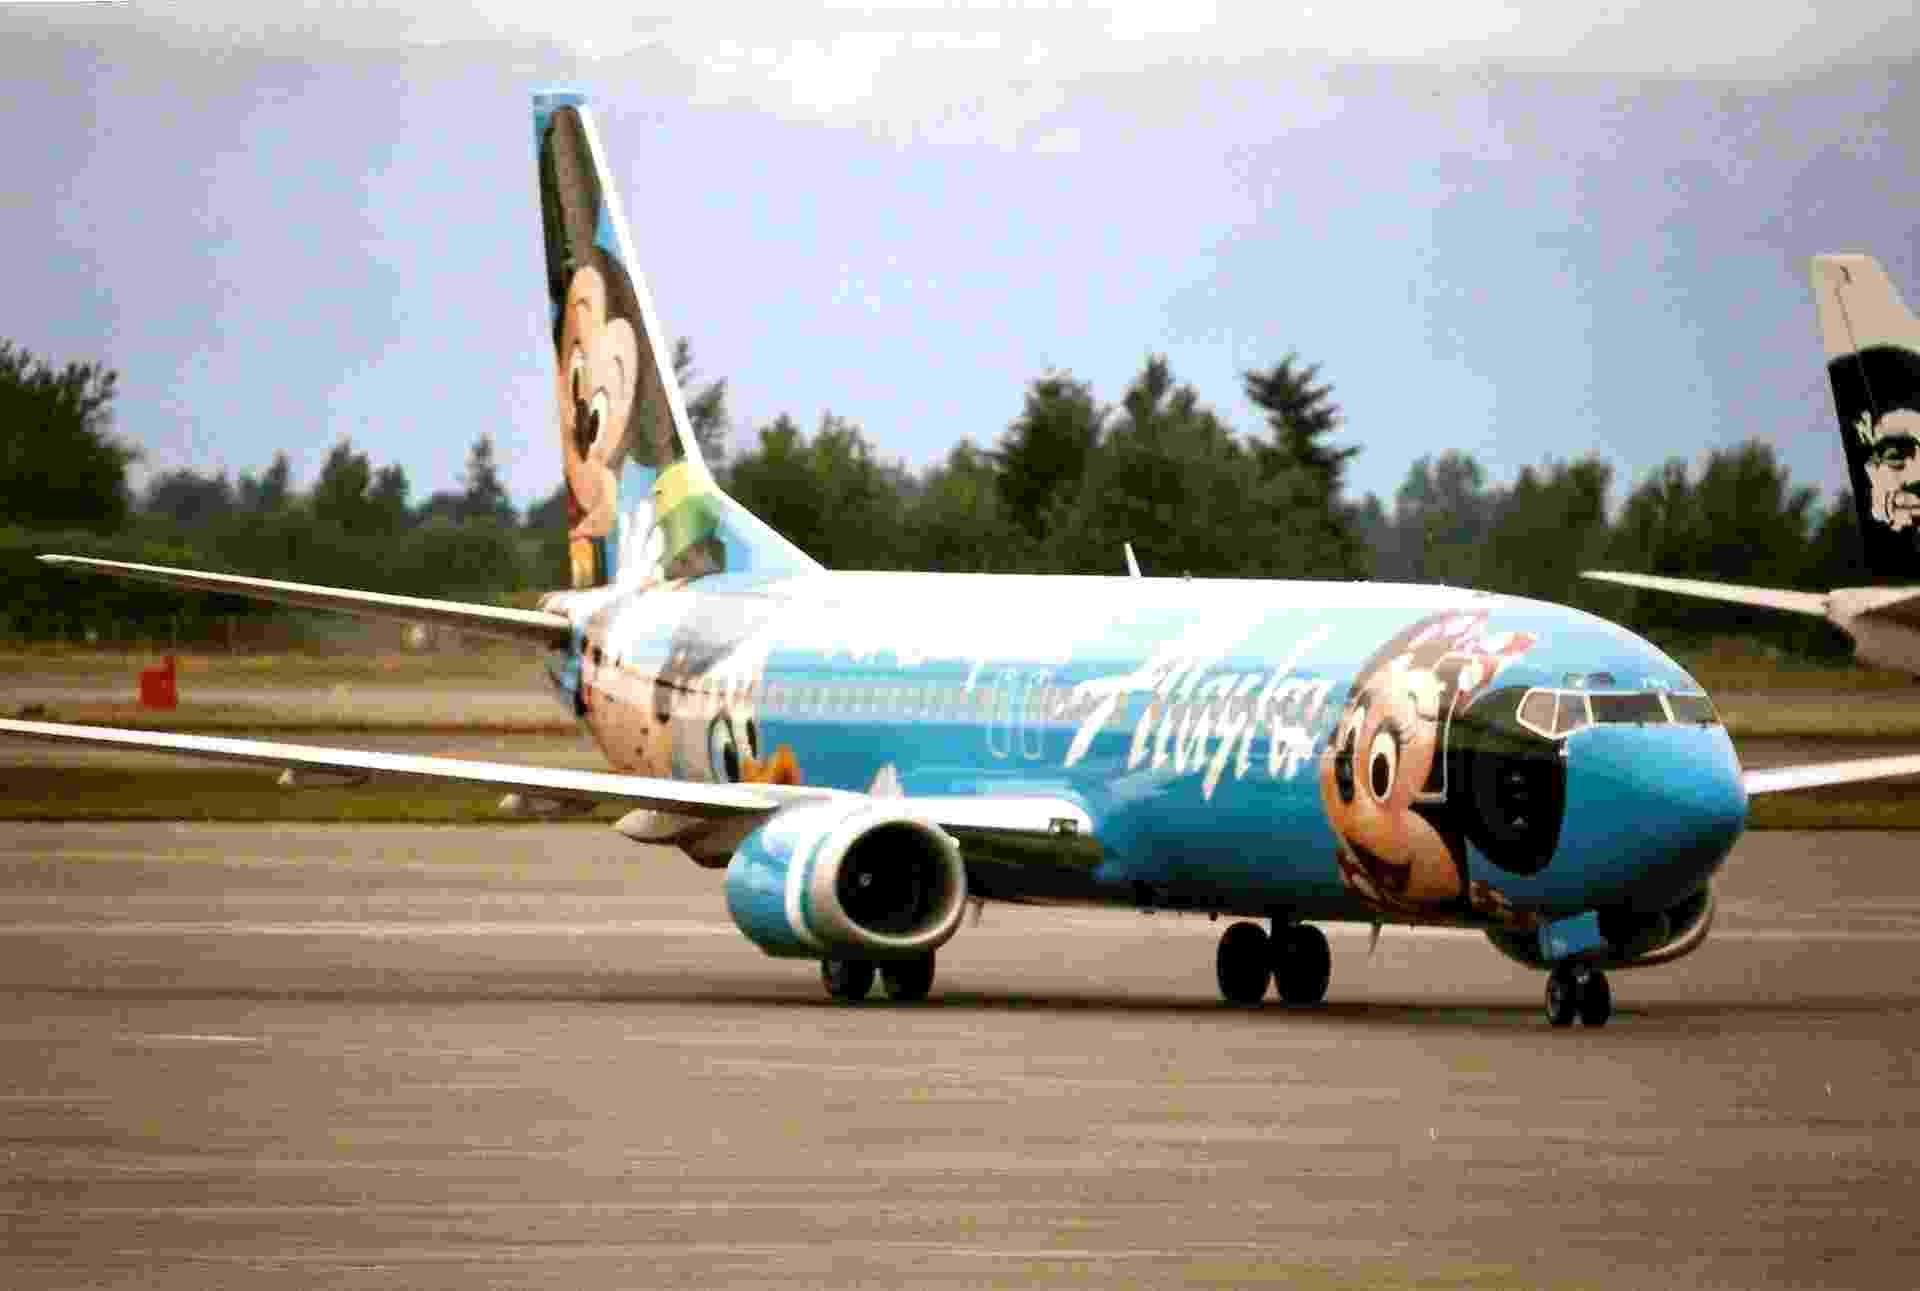 Mickey, Minnie e Pato Donald ilustram esse avião da Alaska Air - Bill Abbott/Flickr